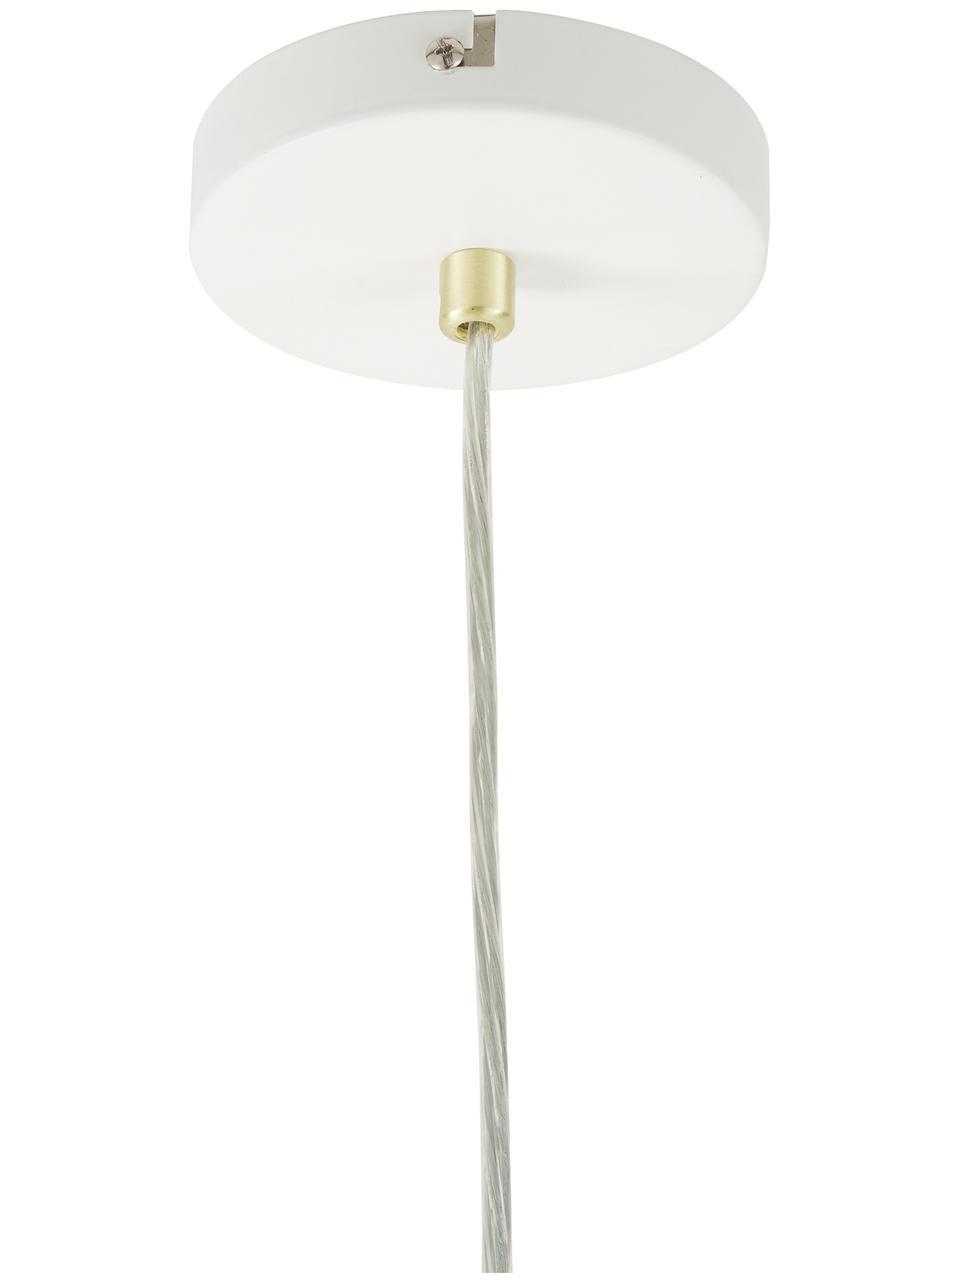 Lampada a sospensione stile nordico Mathea, Baldacchino: metallo verniciato a polv, Paralume: metallo verniciato a polv, Decorazione: metallo ottonato, Bianco, Ø 38 x Alt. 8 cm